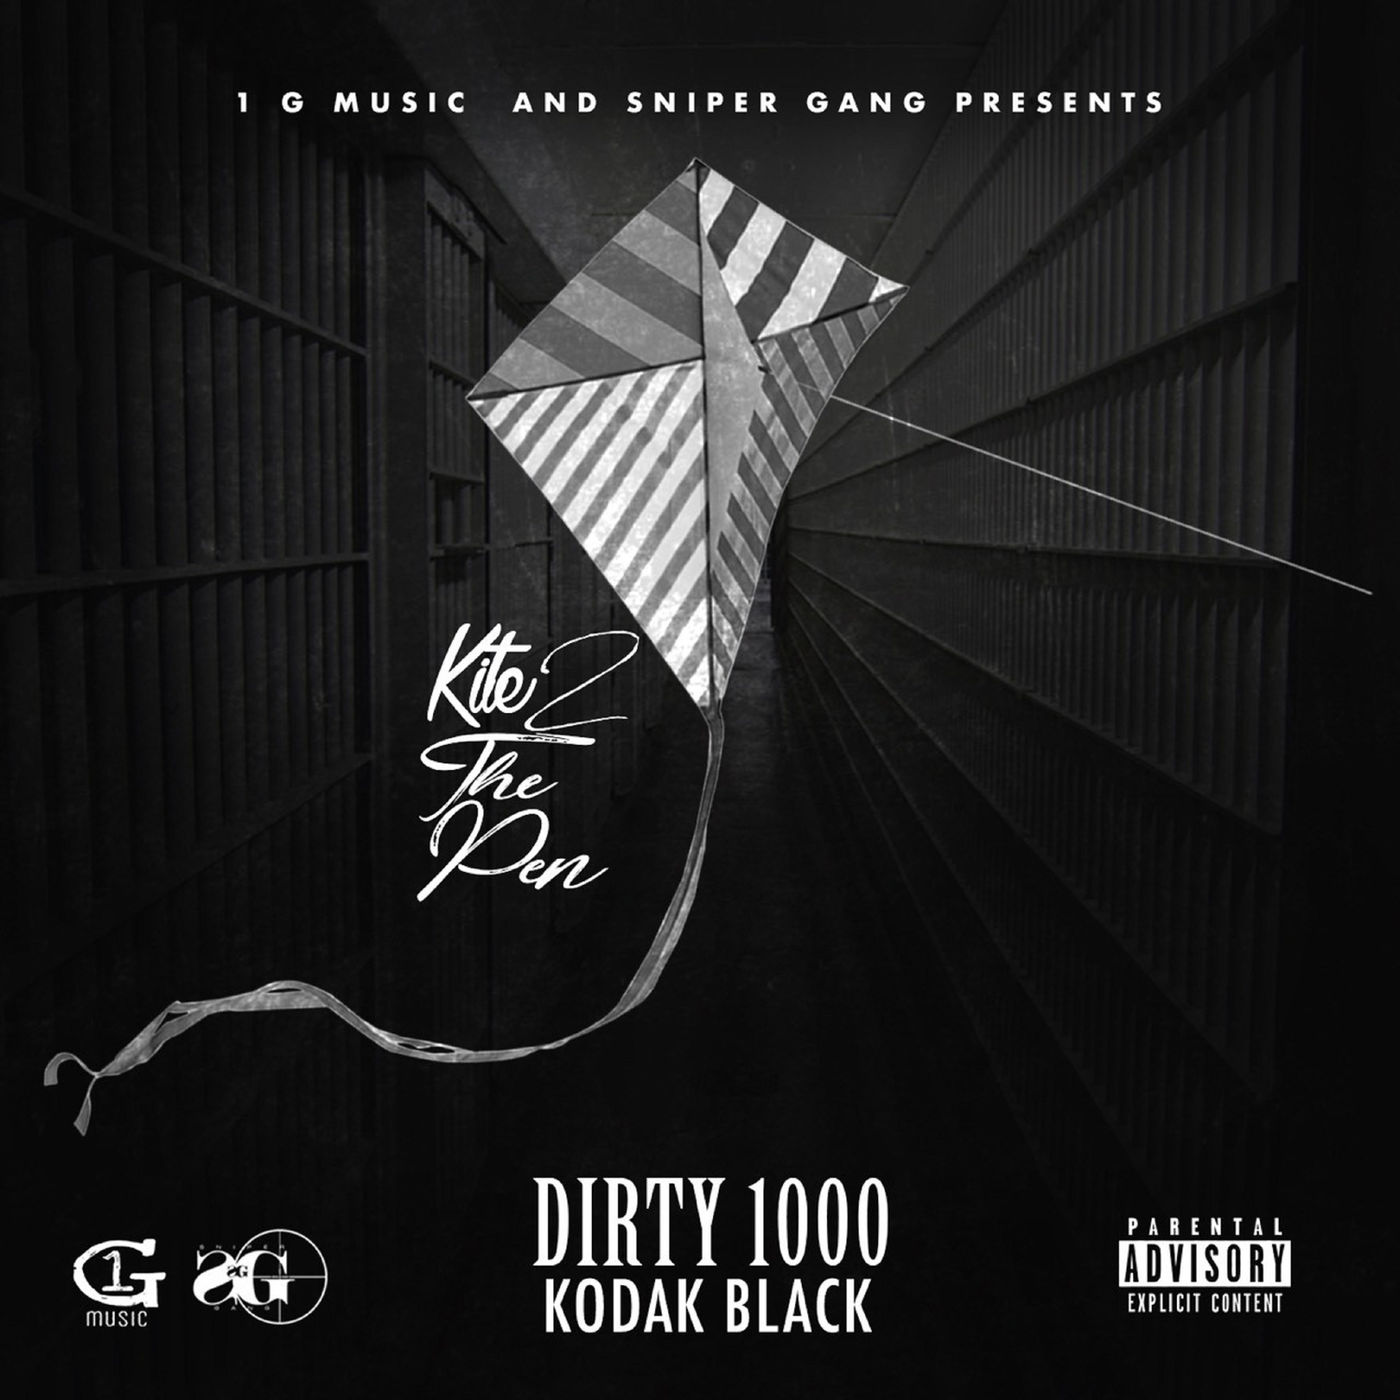 Dirty 1000 - Kite 2 the Pen (feat. Kodak Black) - Single Cover